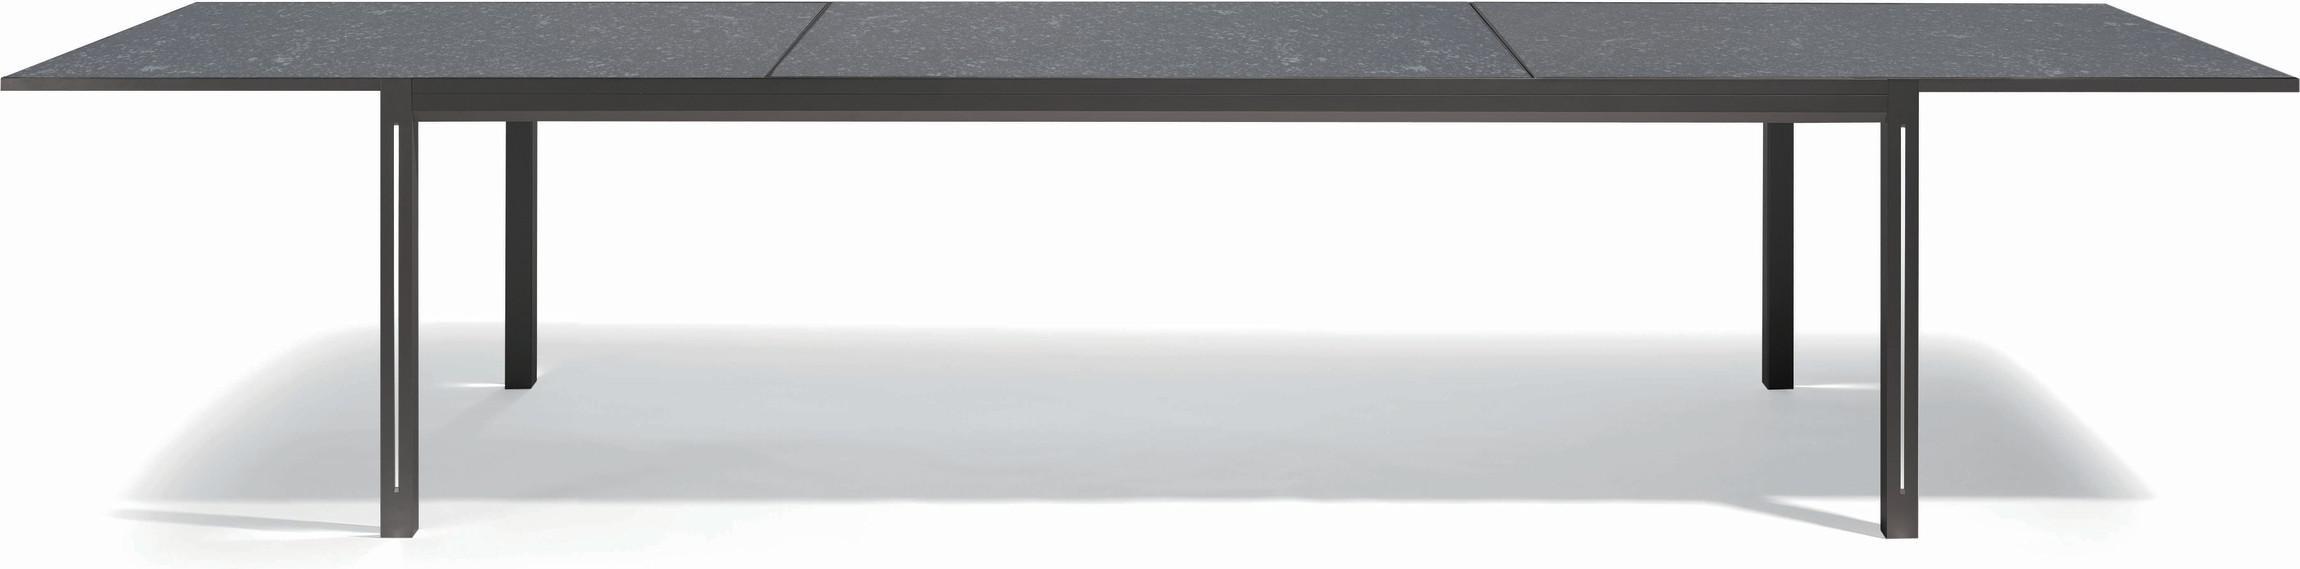 Table à manger Luna - lave - CK 360 - LED